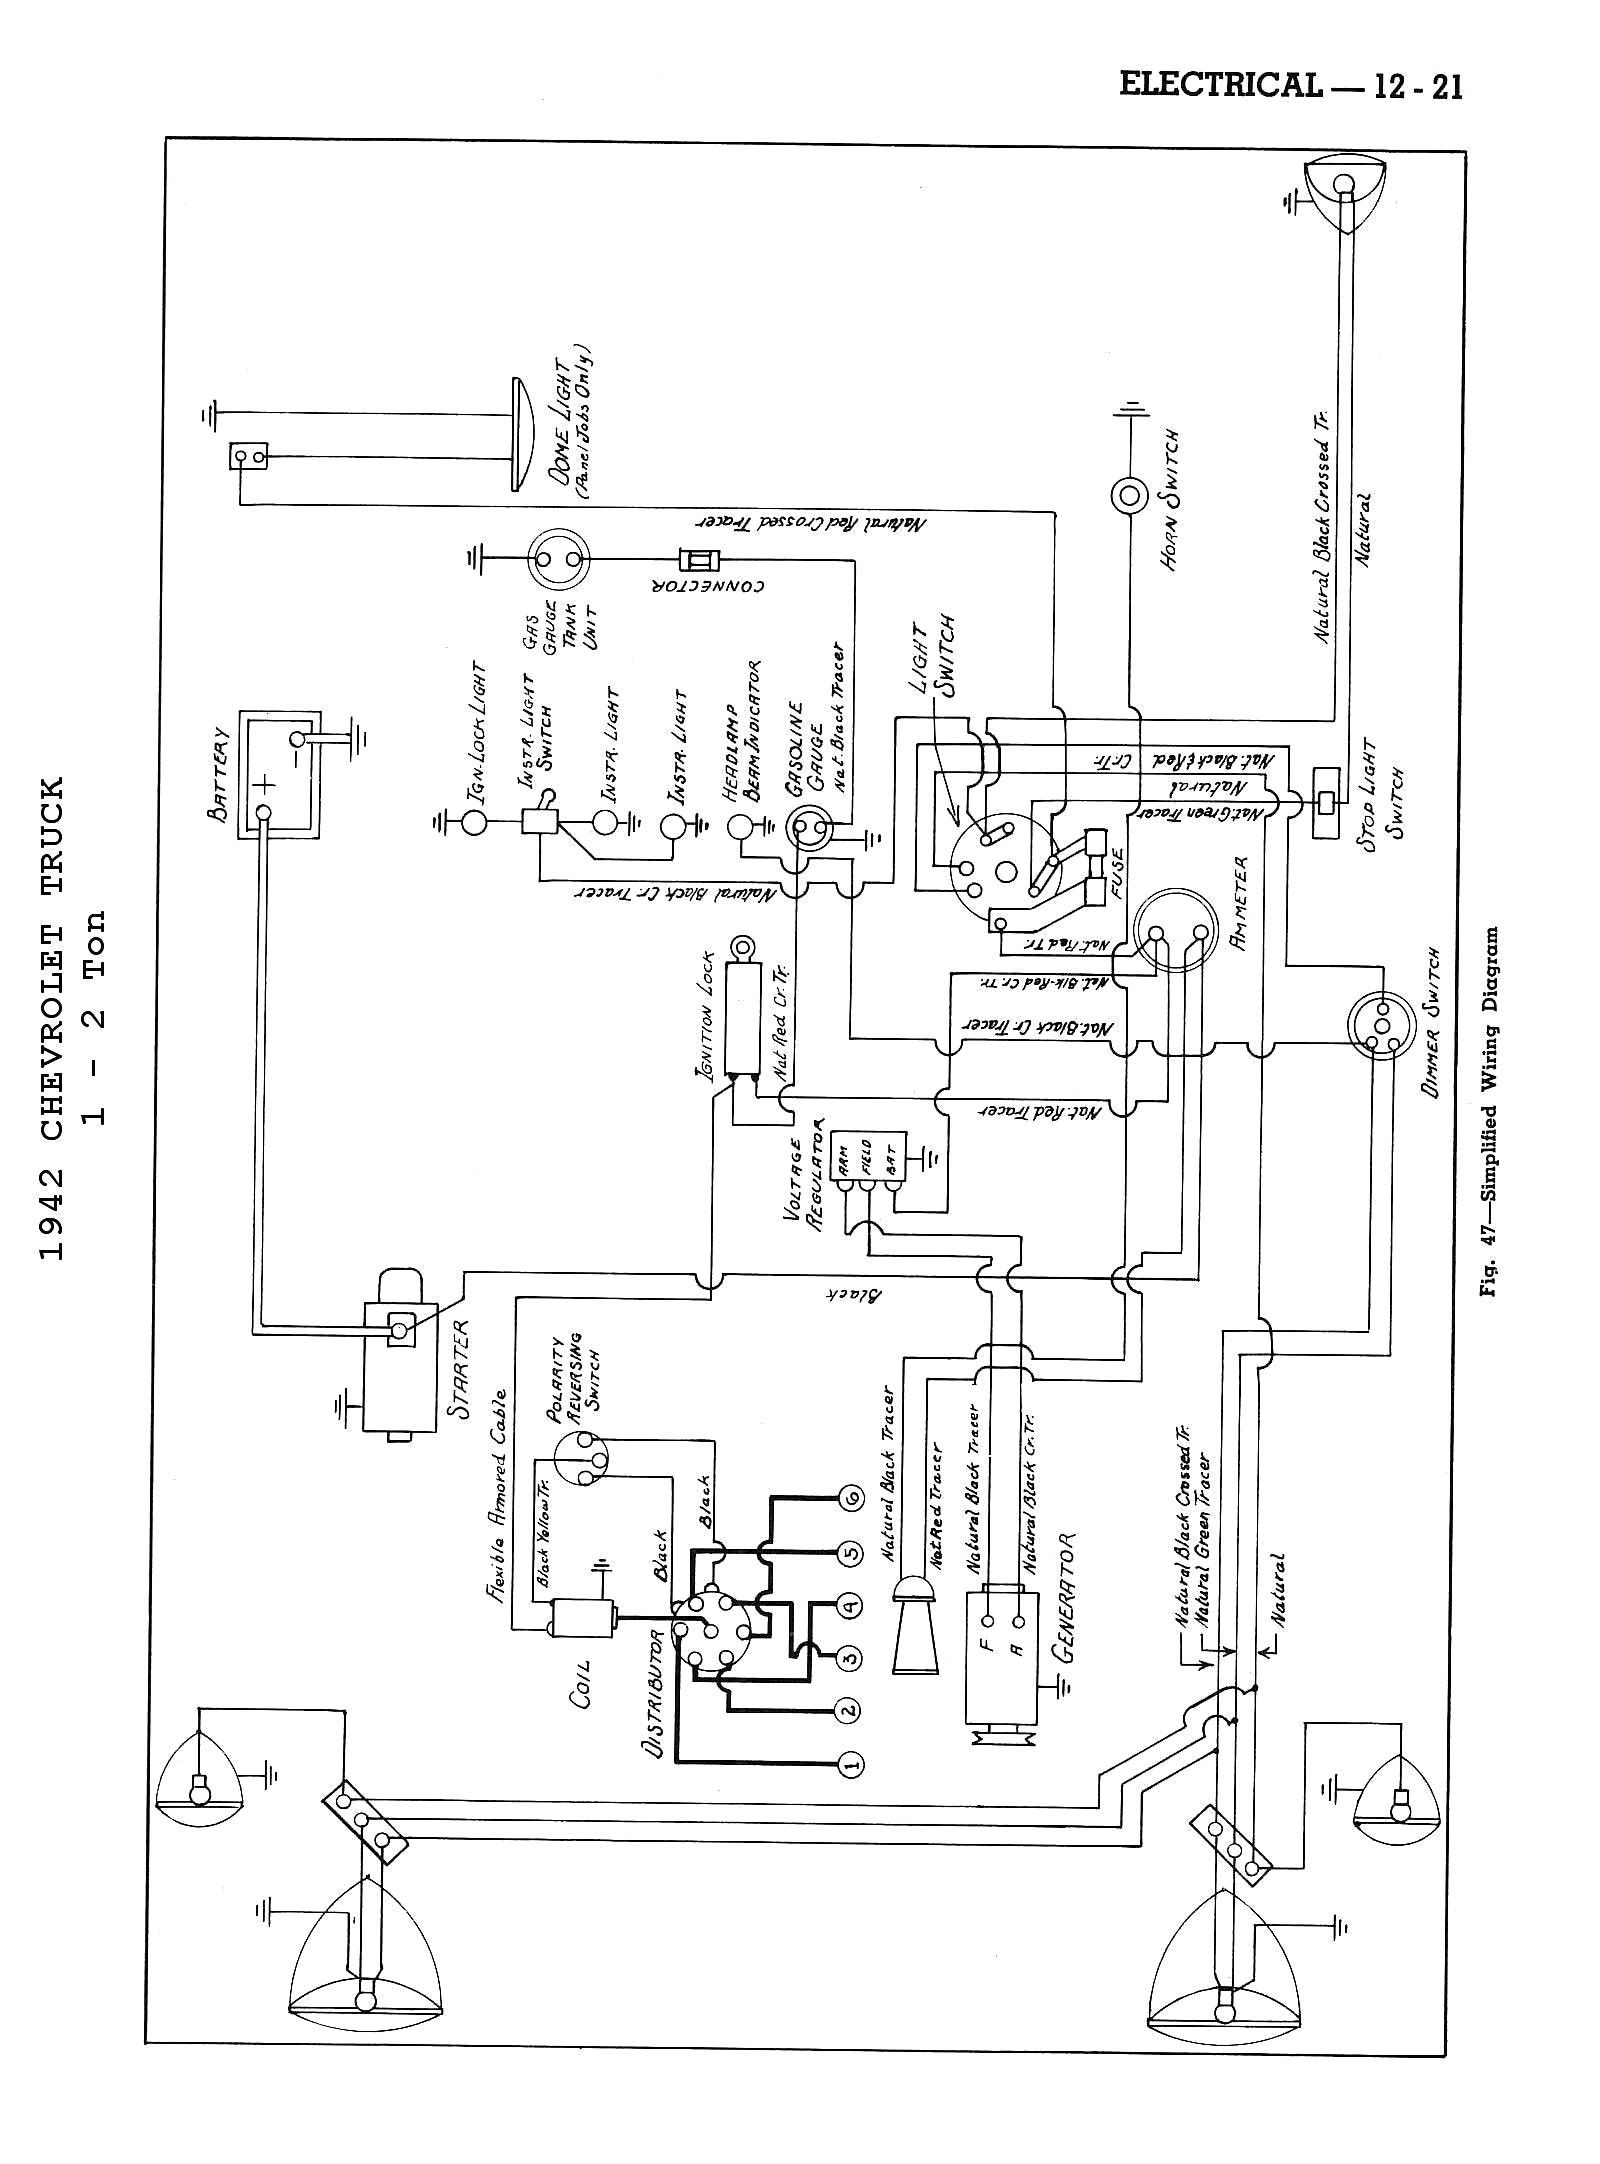 suburban water heater wiring diagram electrical in 2019 kenmore suburban hot water heater wiring diagram suburban [ 1600 x 2164 Pixel ]